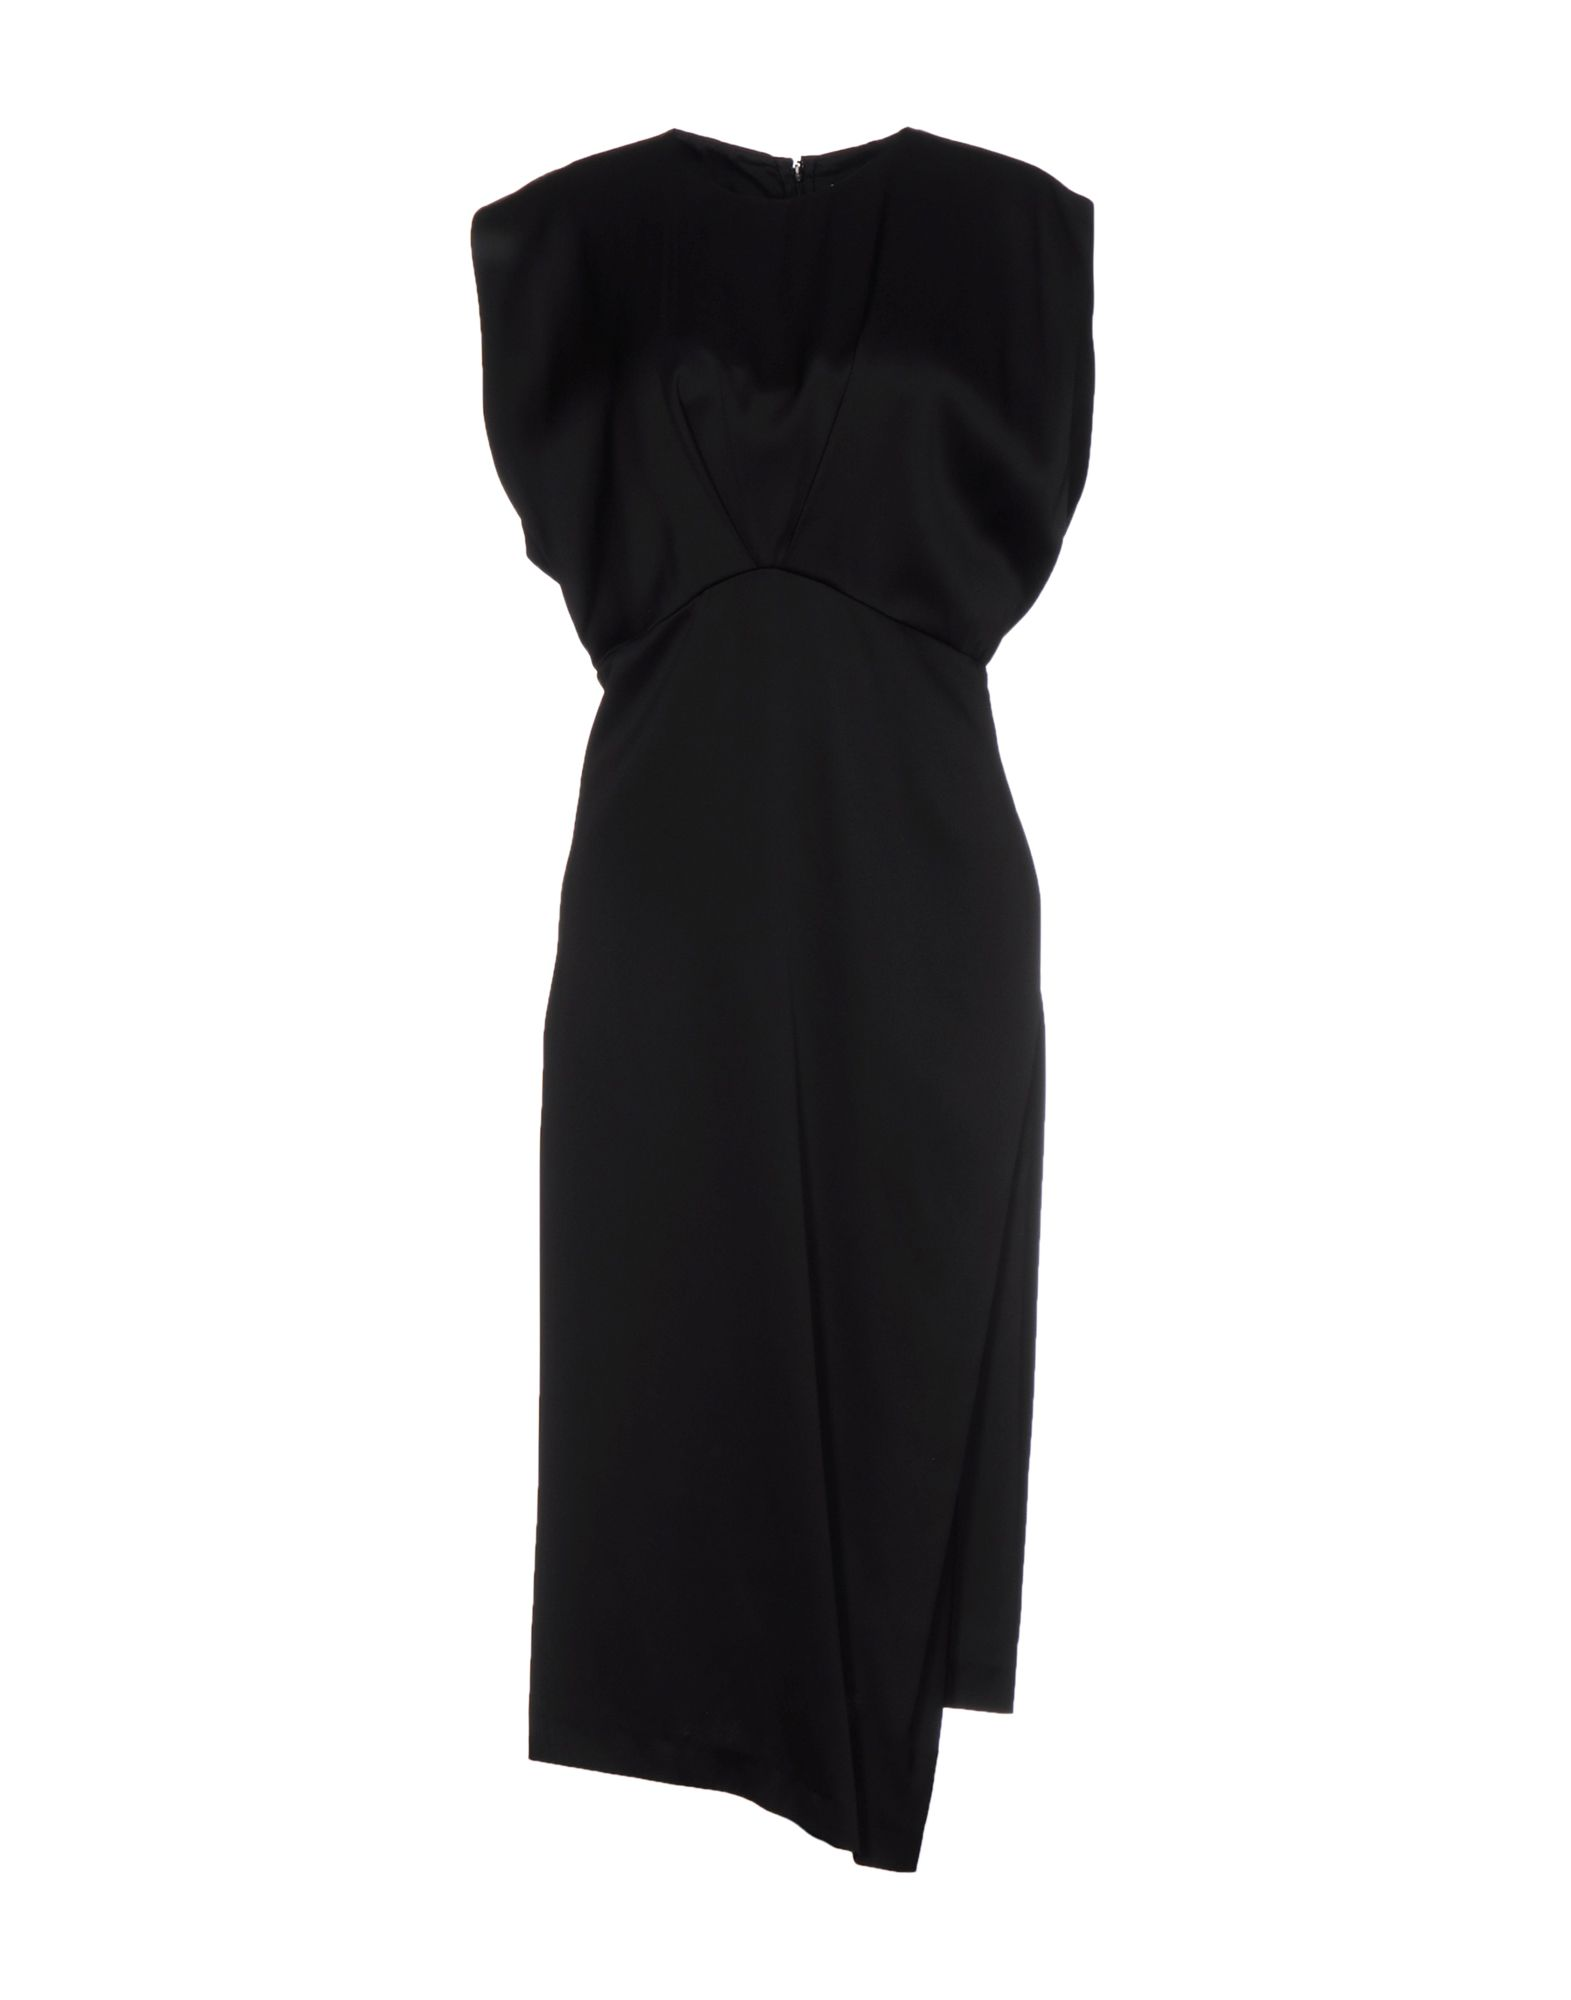 JIL SANDER Платье длиной 3/4 lisa corti платье длиной 3 4